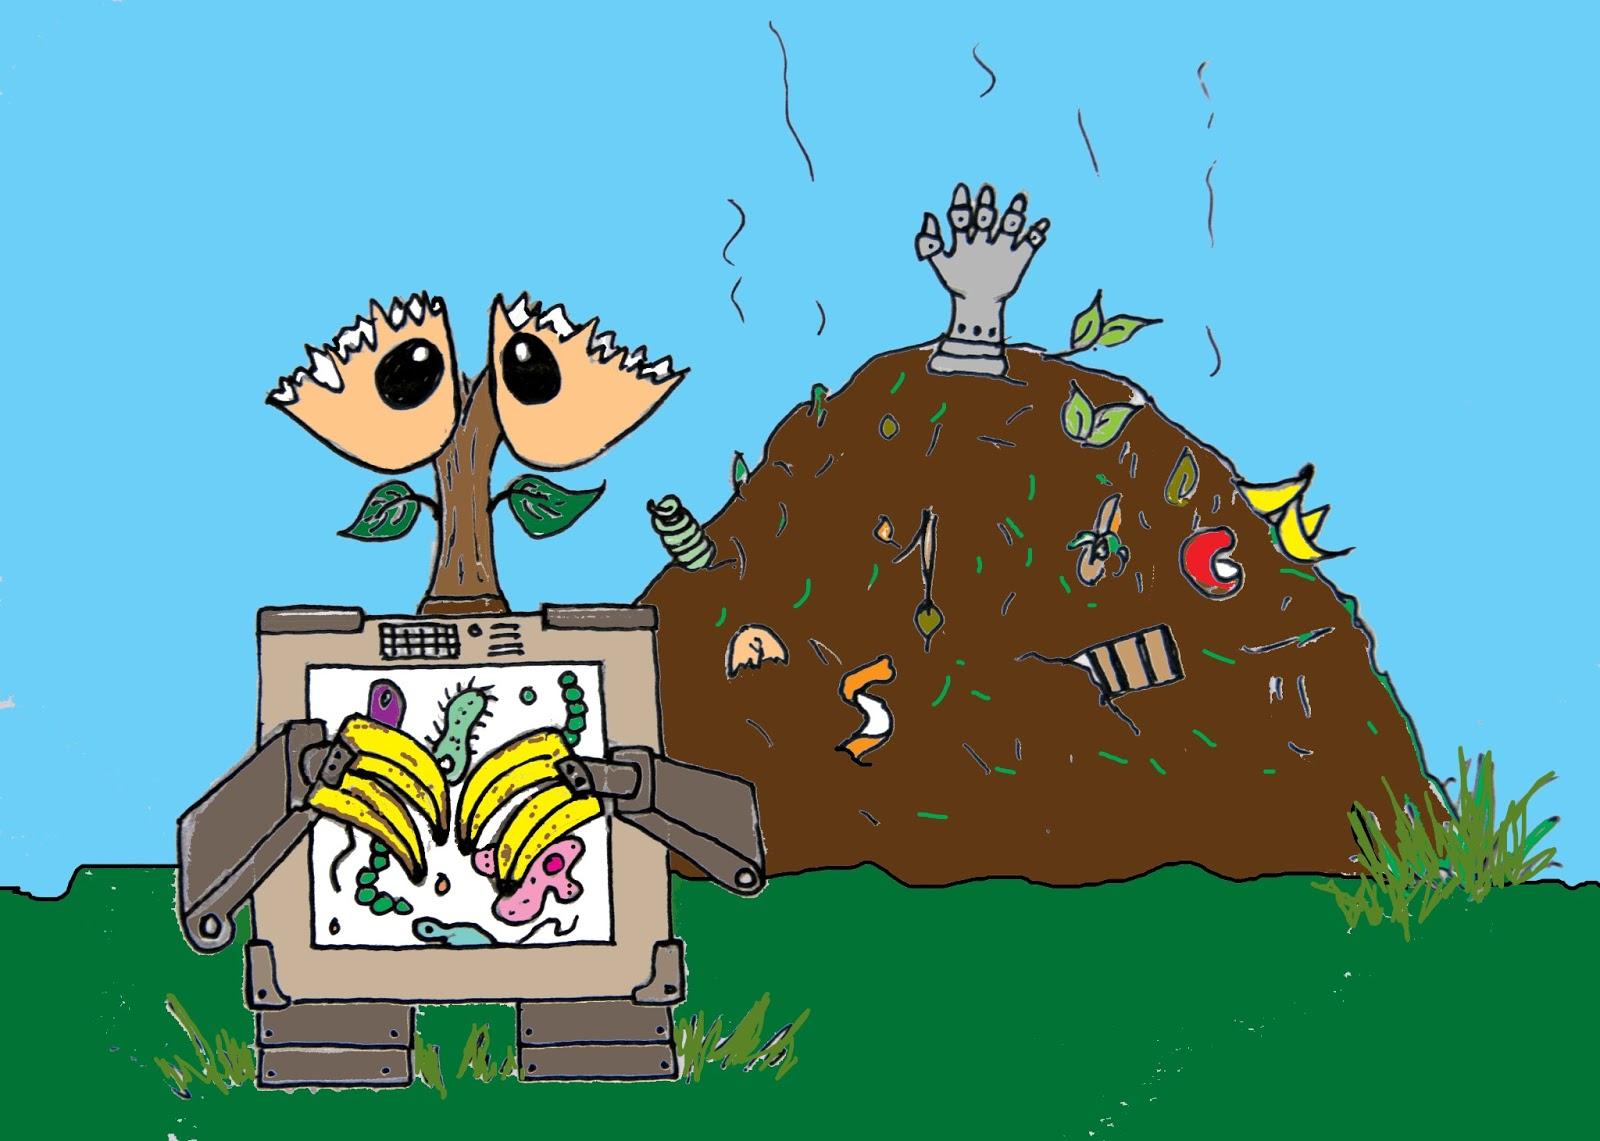 Ro-botany: rotting robots in the garden